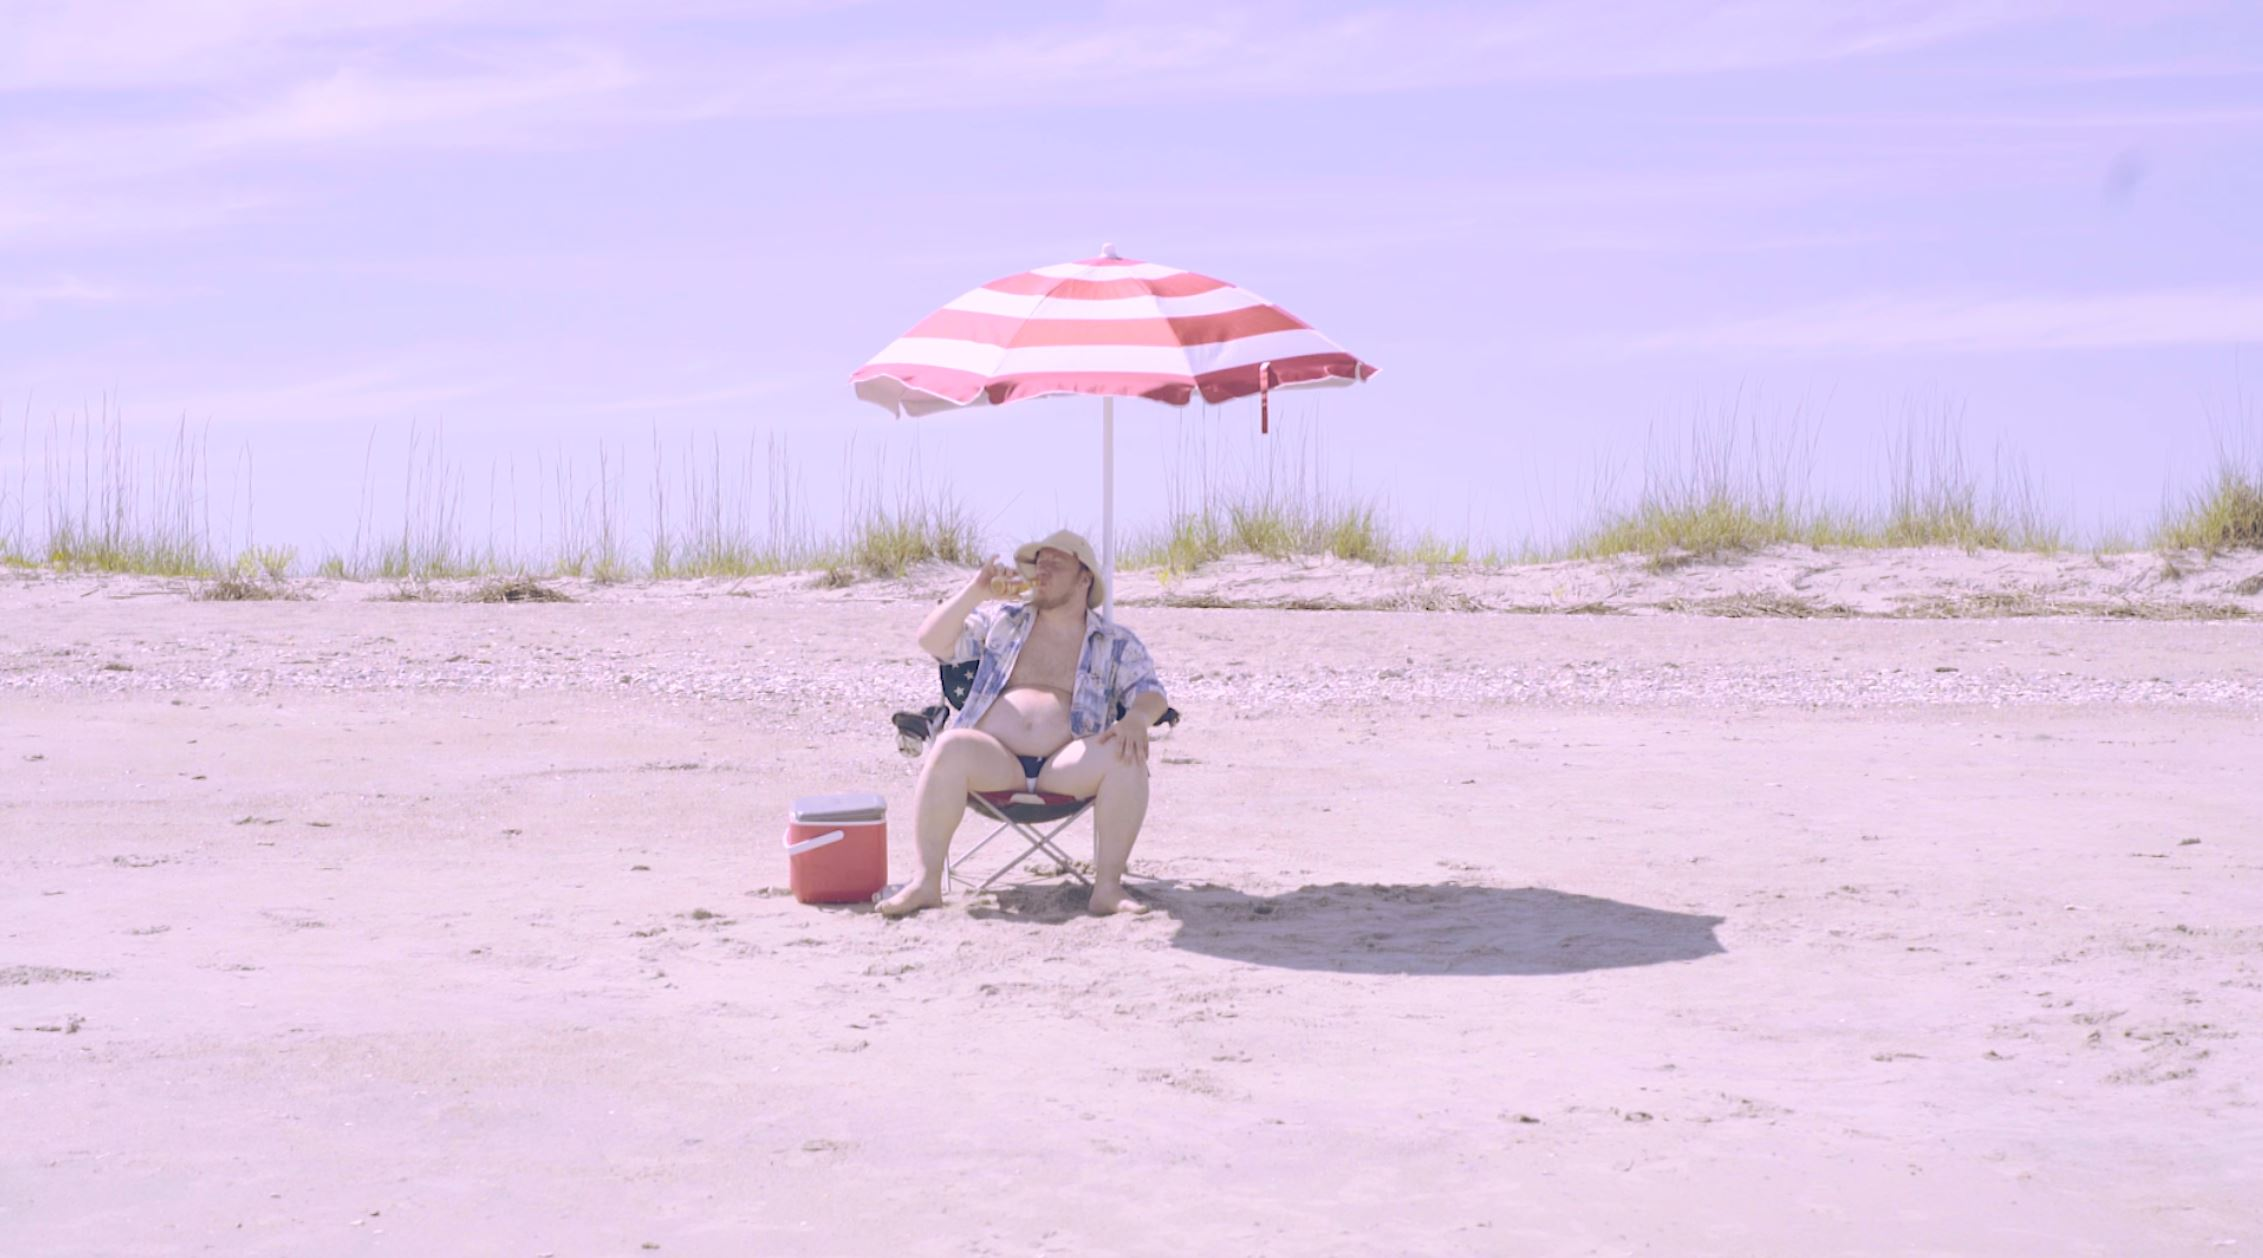 Return to the Tide (2017) - 12 min